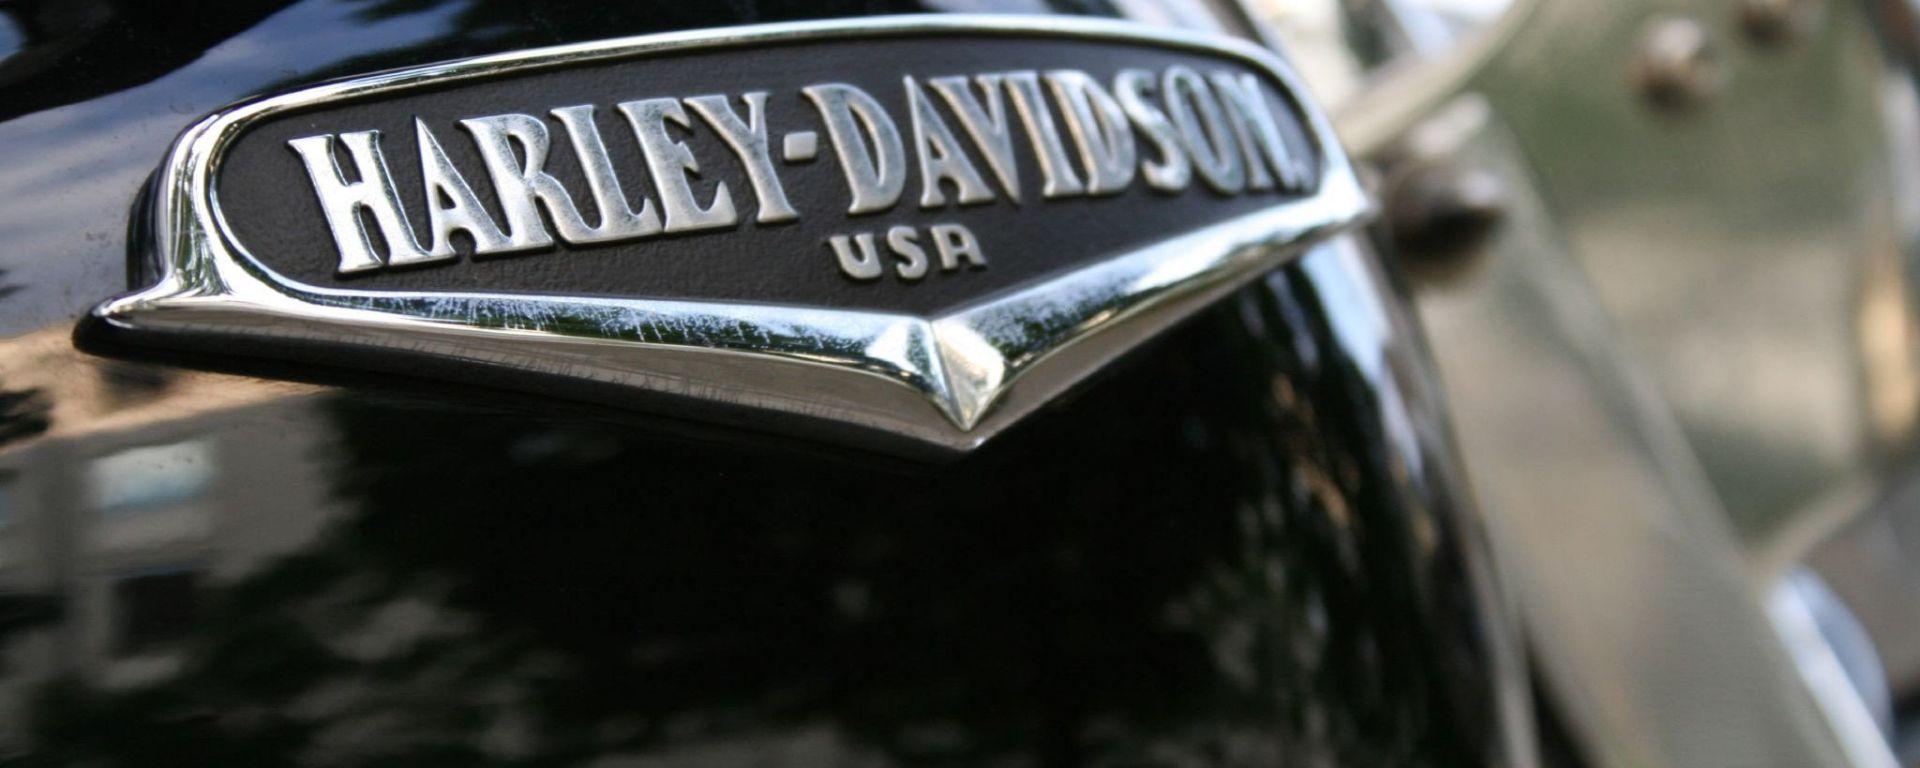 Harley Davidson low-cost: made in India pensata per l'Europa